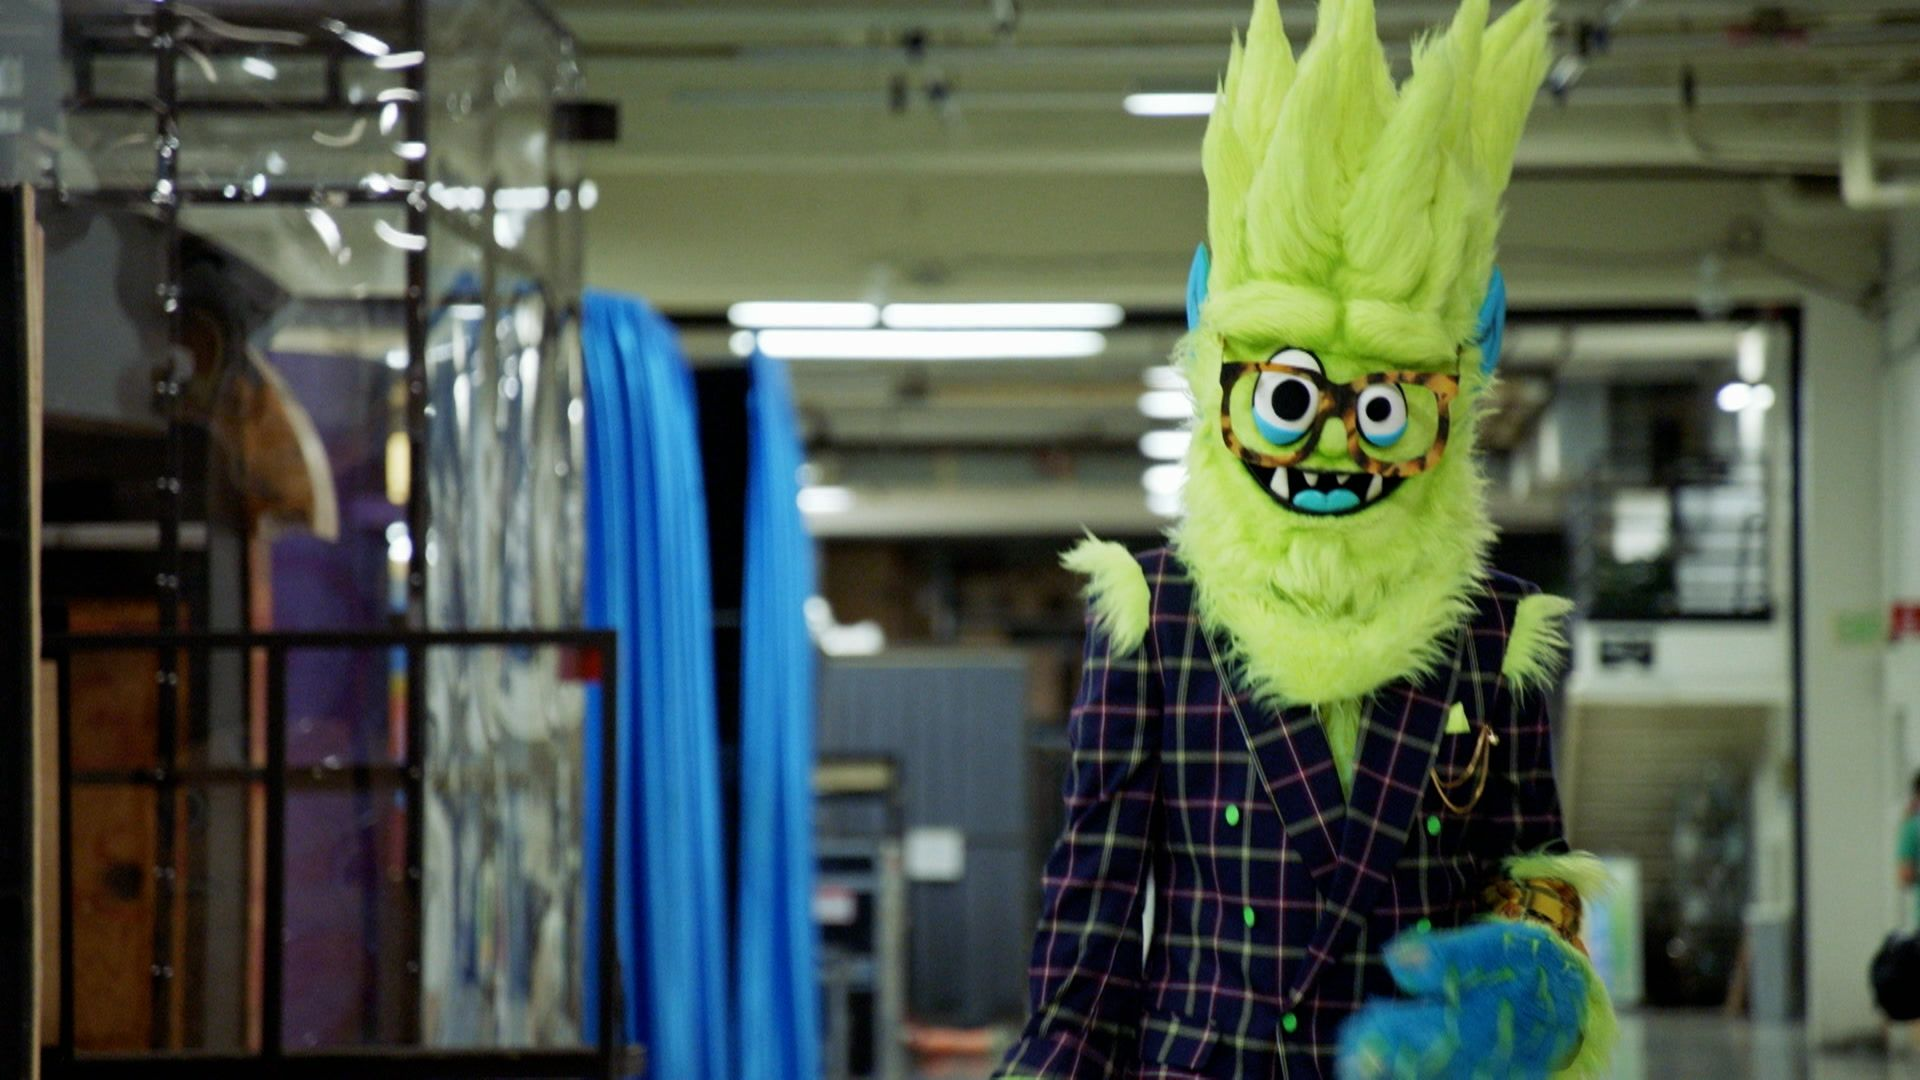 The Masked Singer - Super Sneak Peek extra